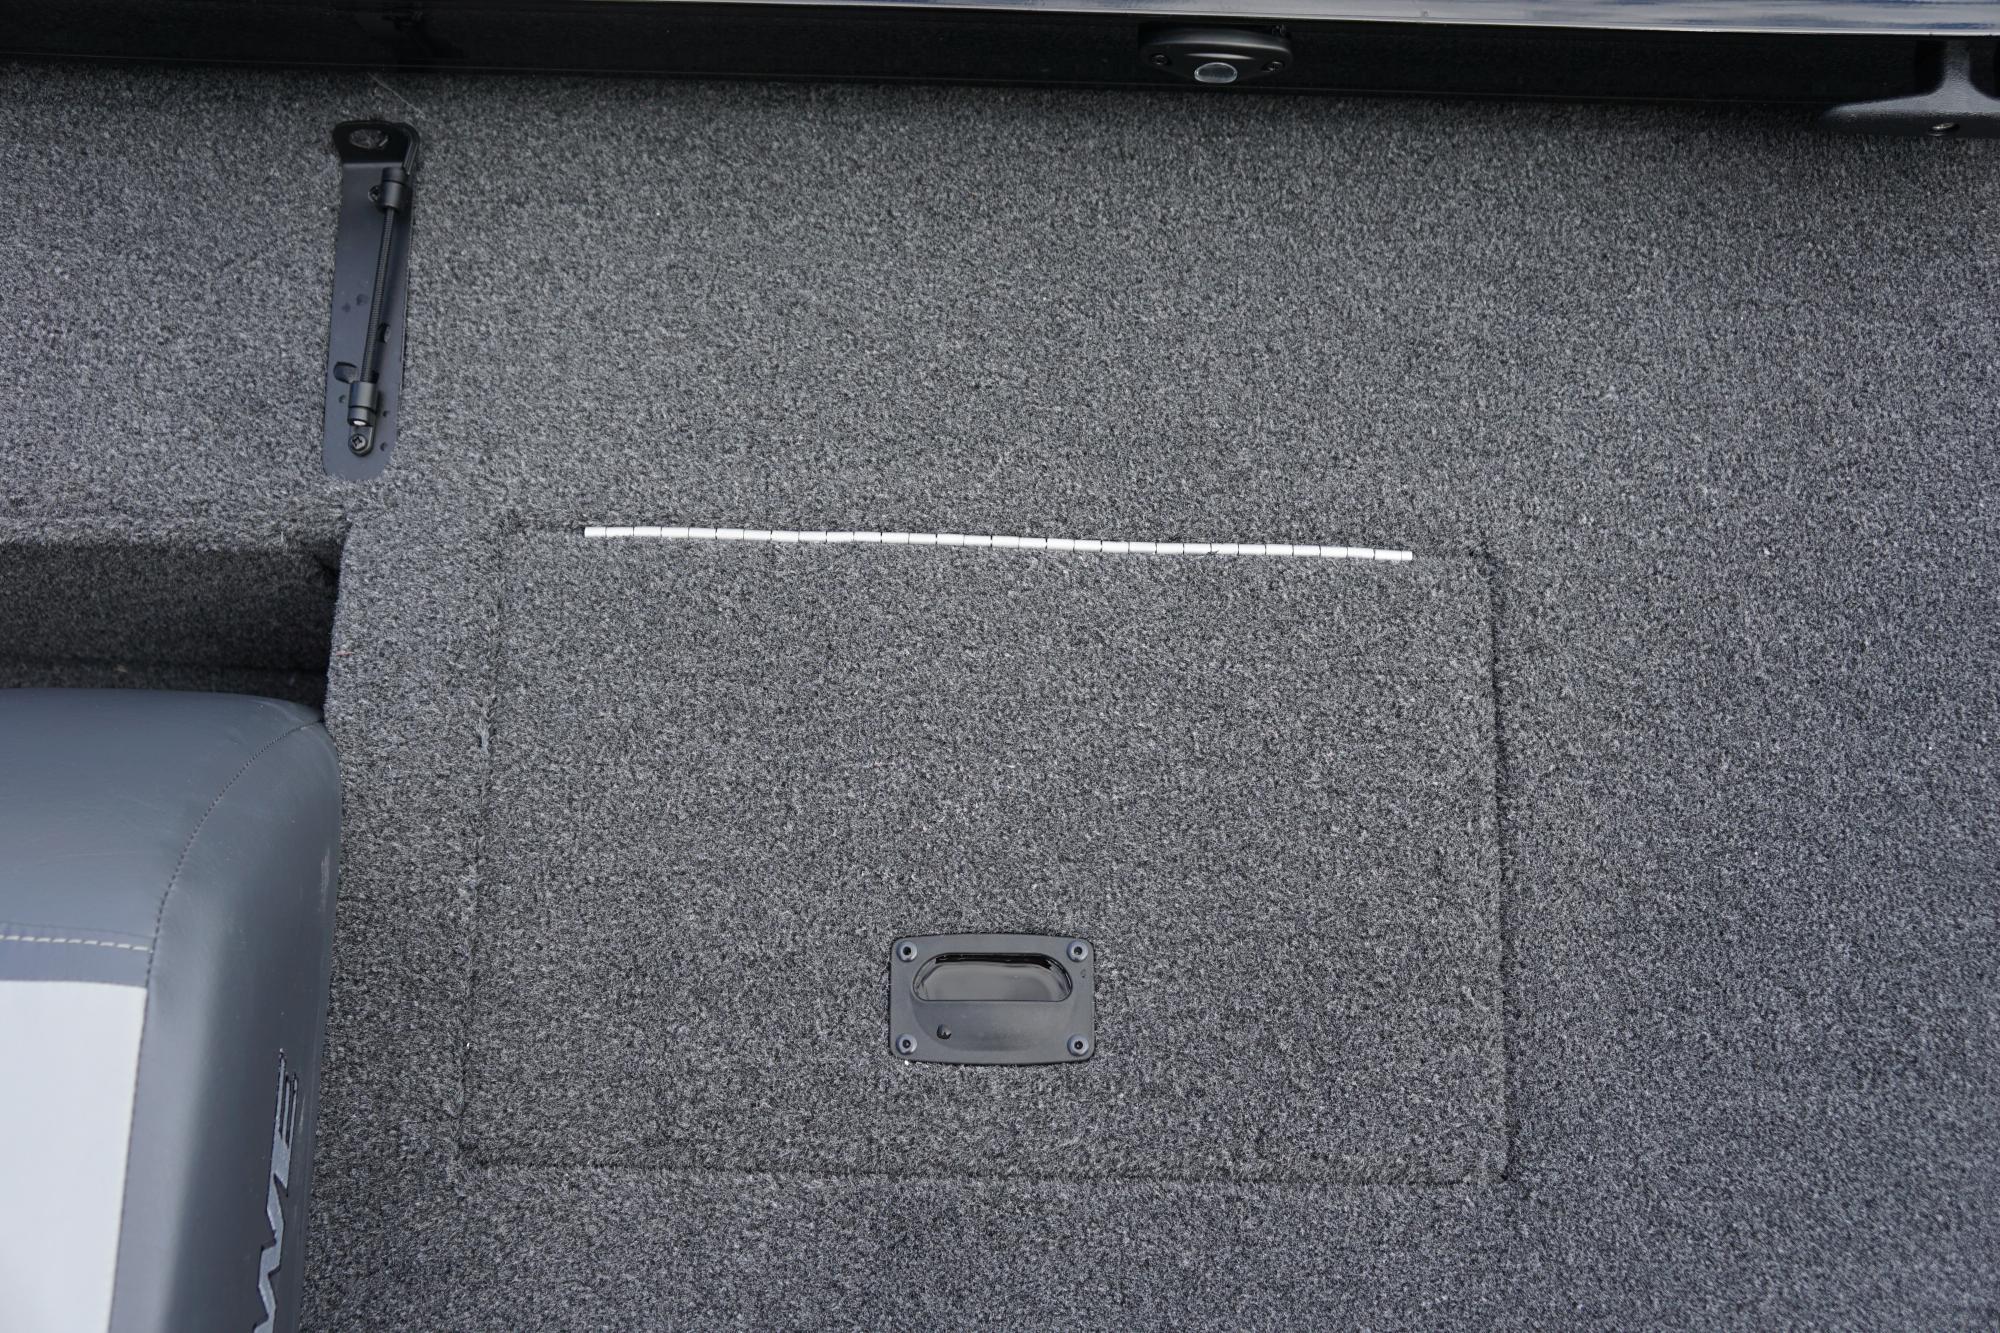 2019 LOWE STINGER 178 W/ 90 HP MERCURY